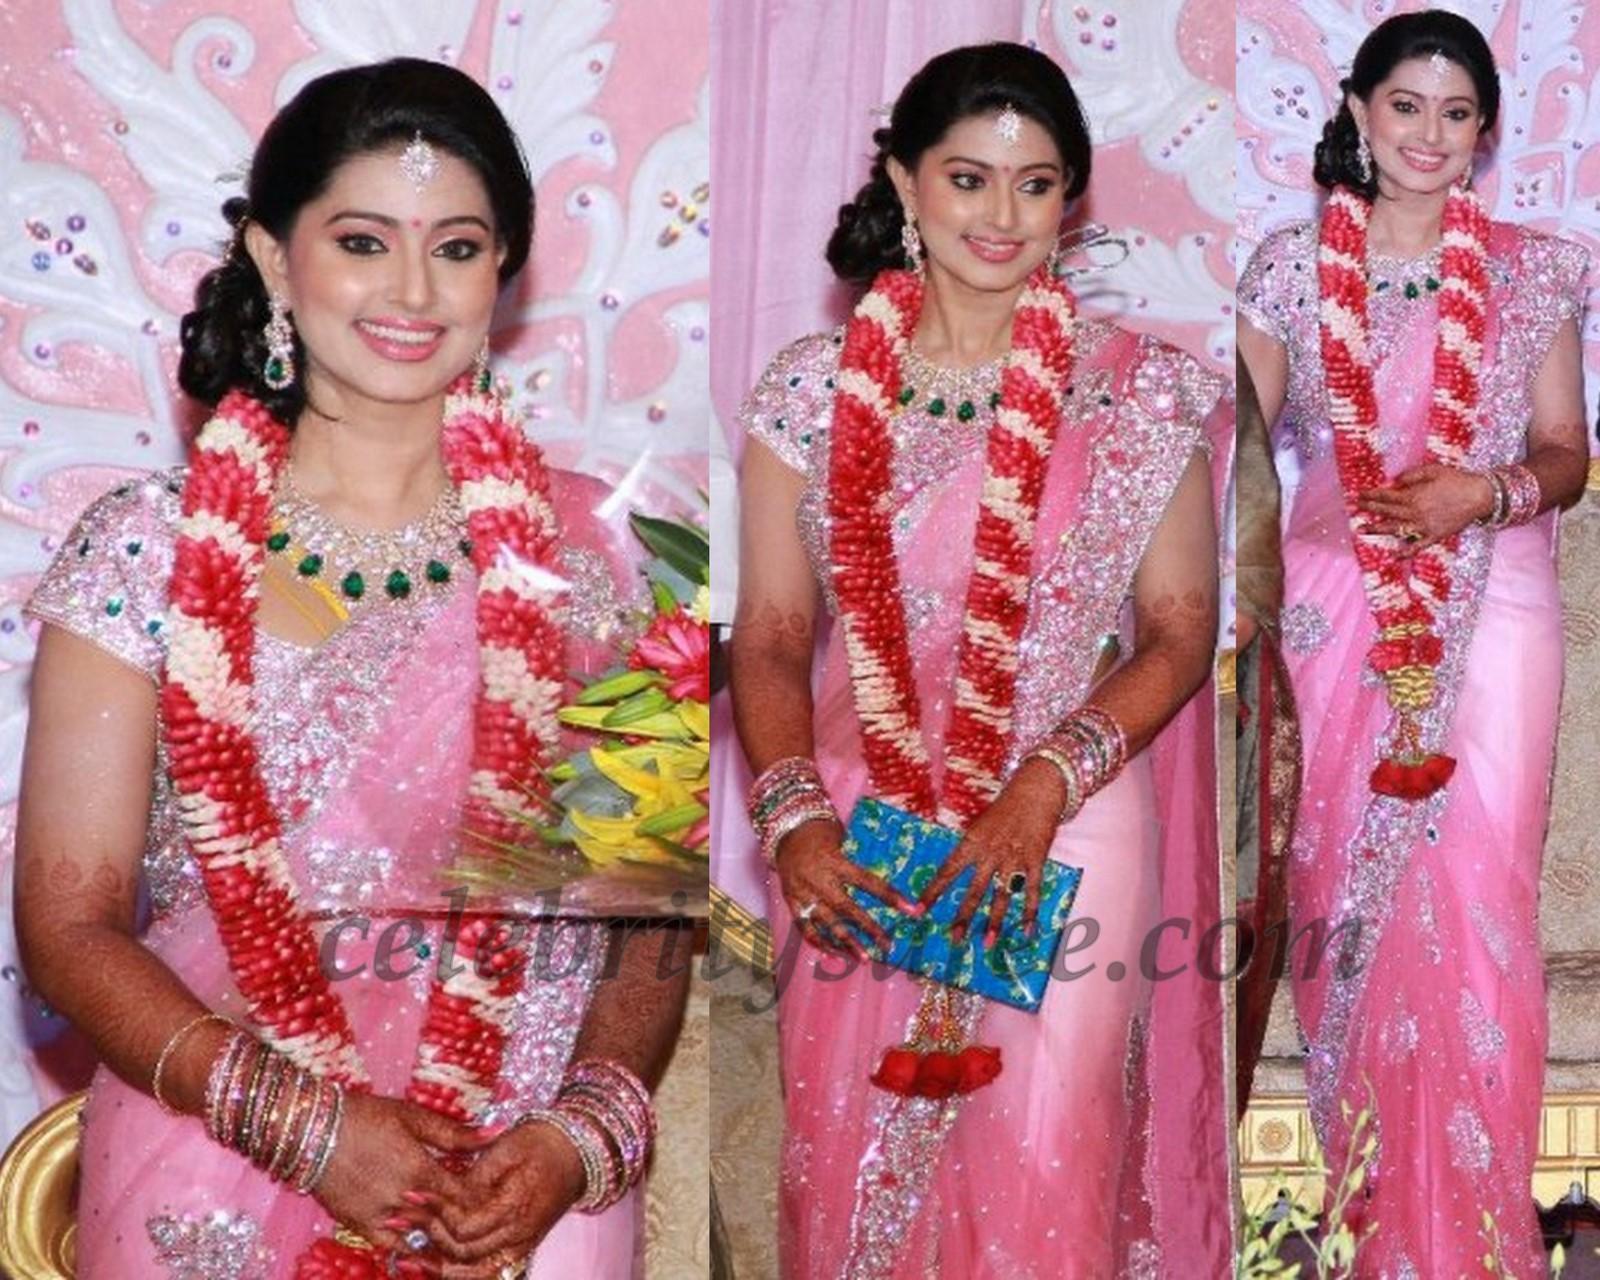 Dream Indian Wedding Reception Attire Flamboyant Lehenga Or Rich Designer Saree